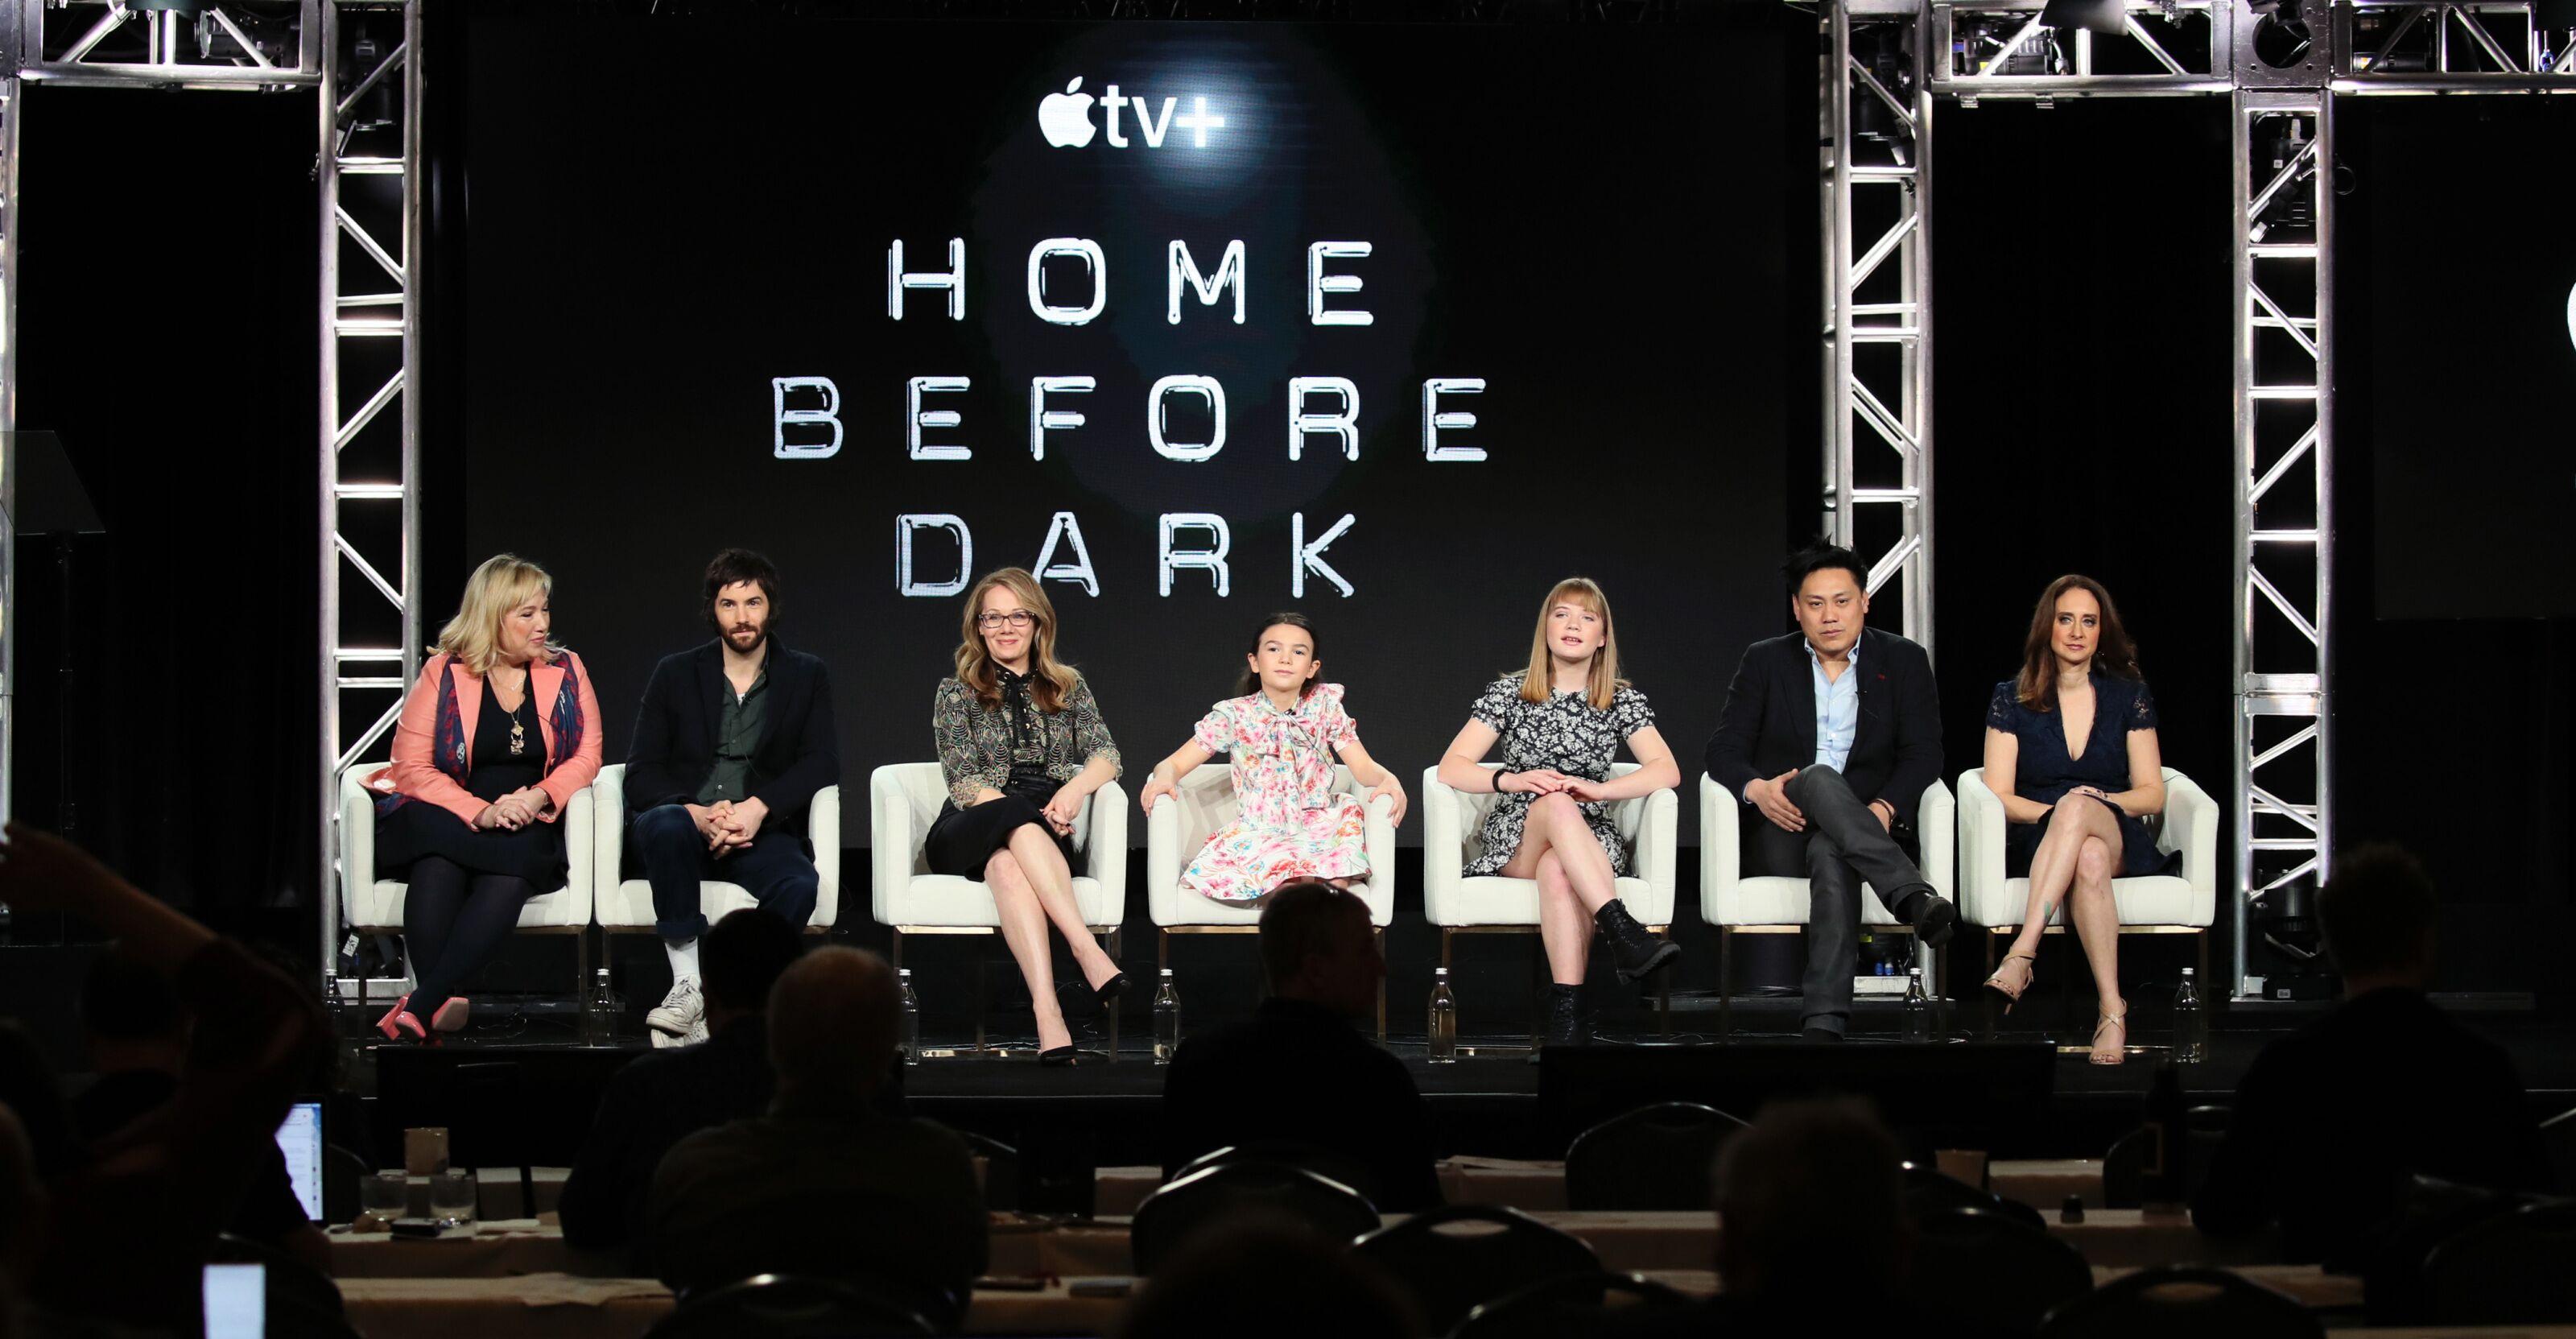 Home Before Dark: Apple series gets an early season 2 renewal